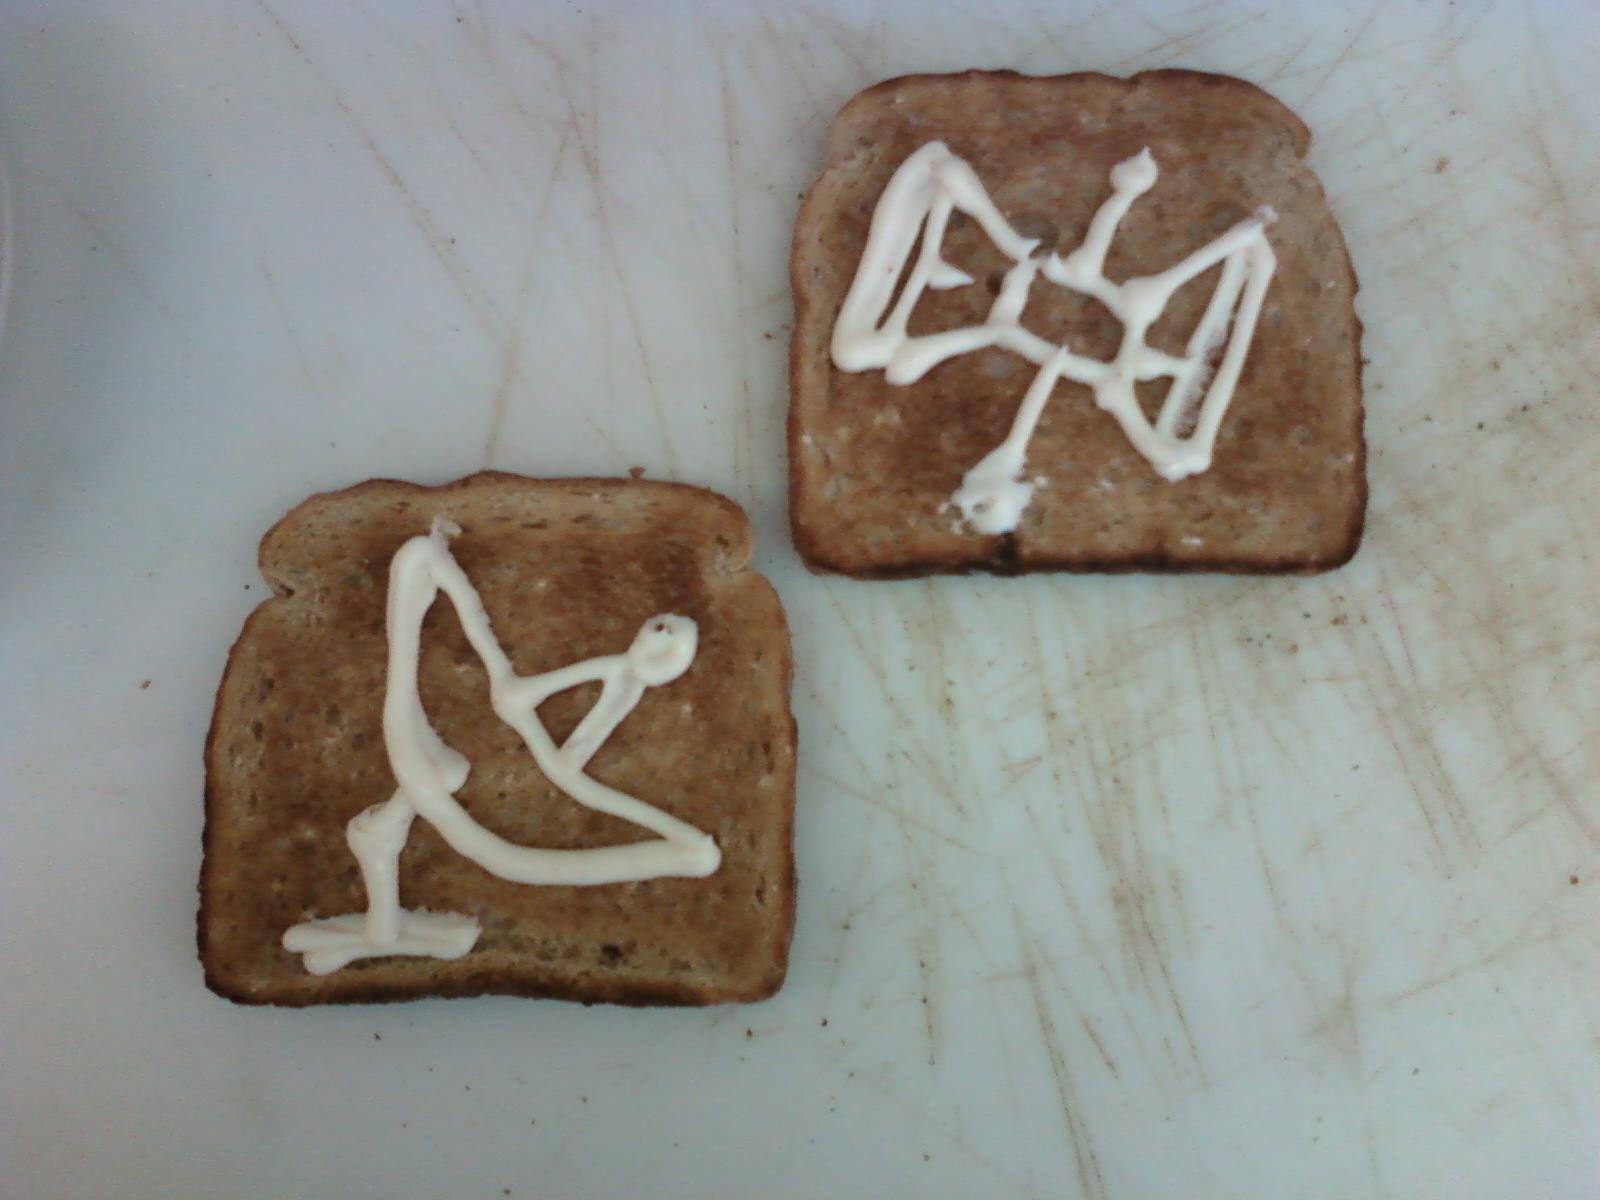 sandwich_art/0711110913.jpg